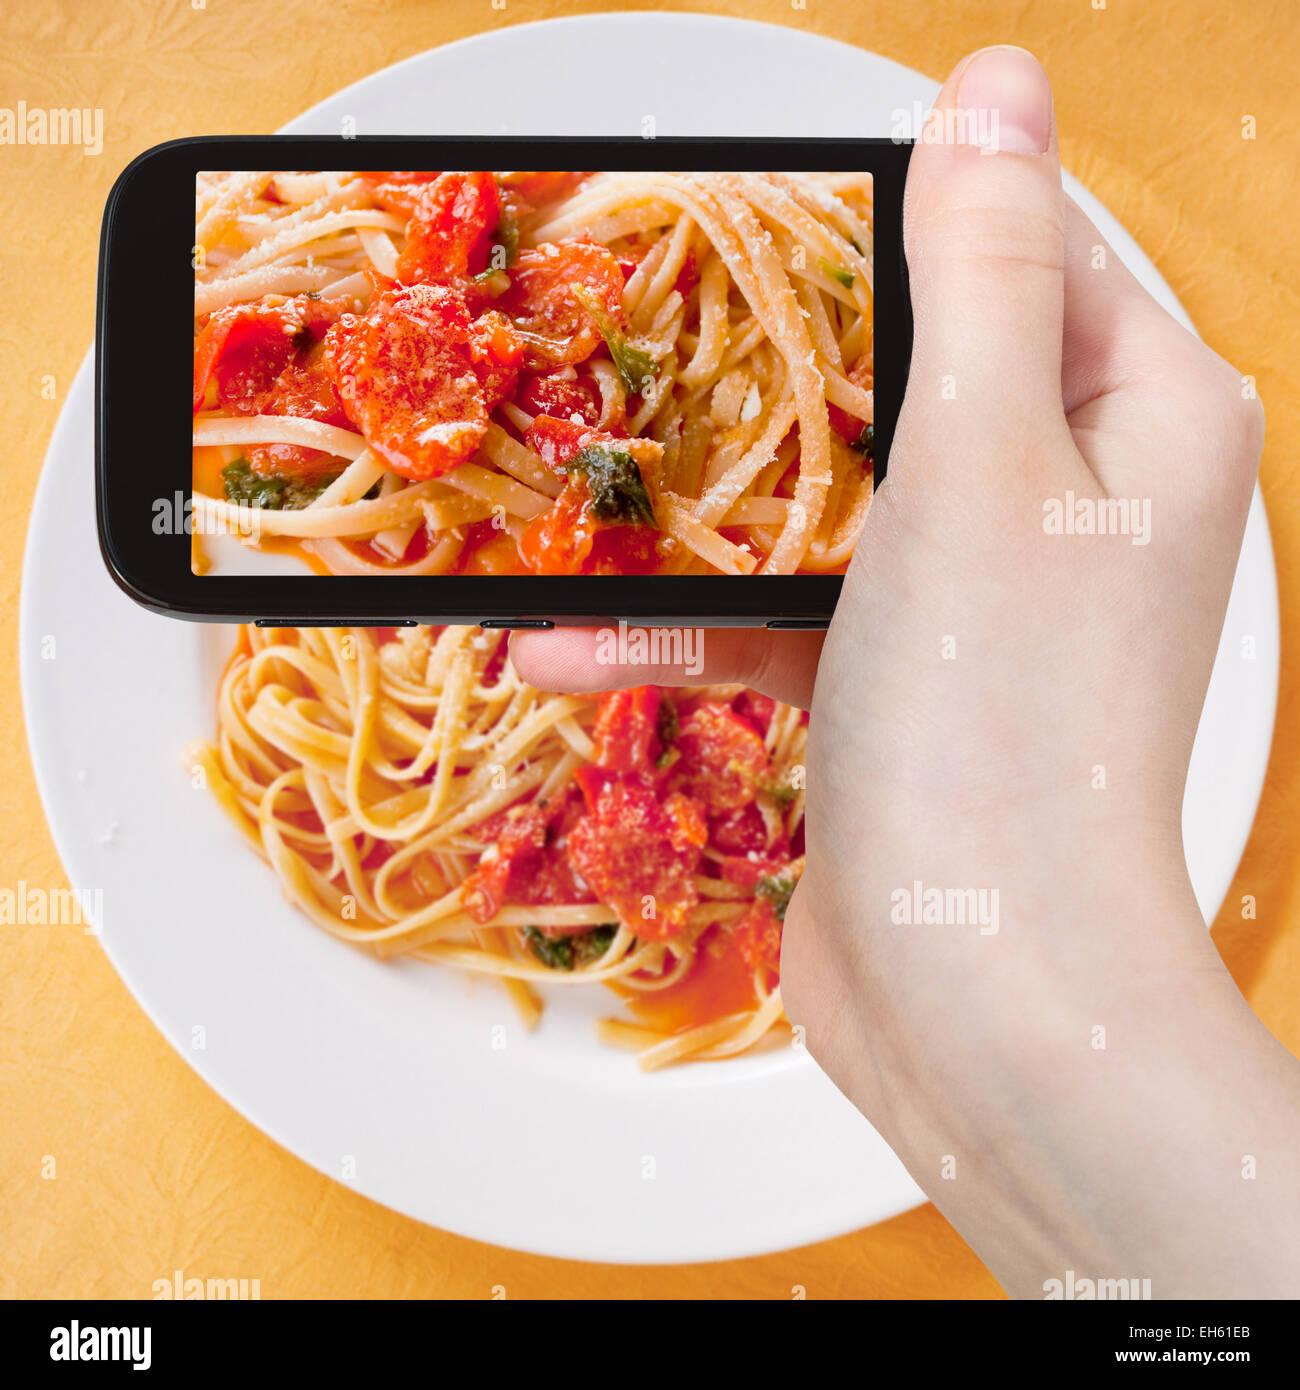 Fotografiar comida concepto - toma de fotografía turística de espaguetis con salsa de tomate picante sobre placa blanca en gadget móvil, Italia Foto de stock